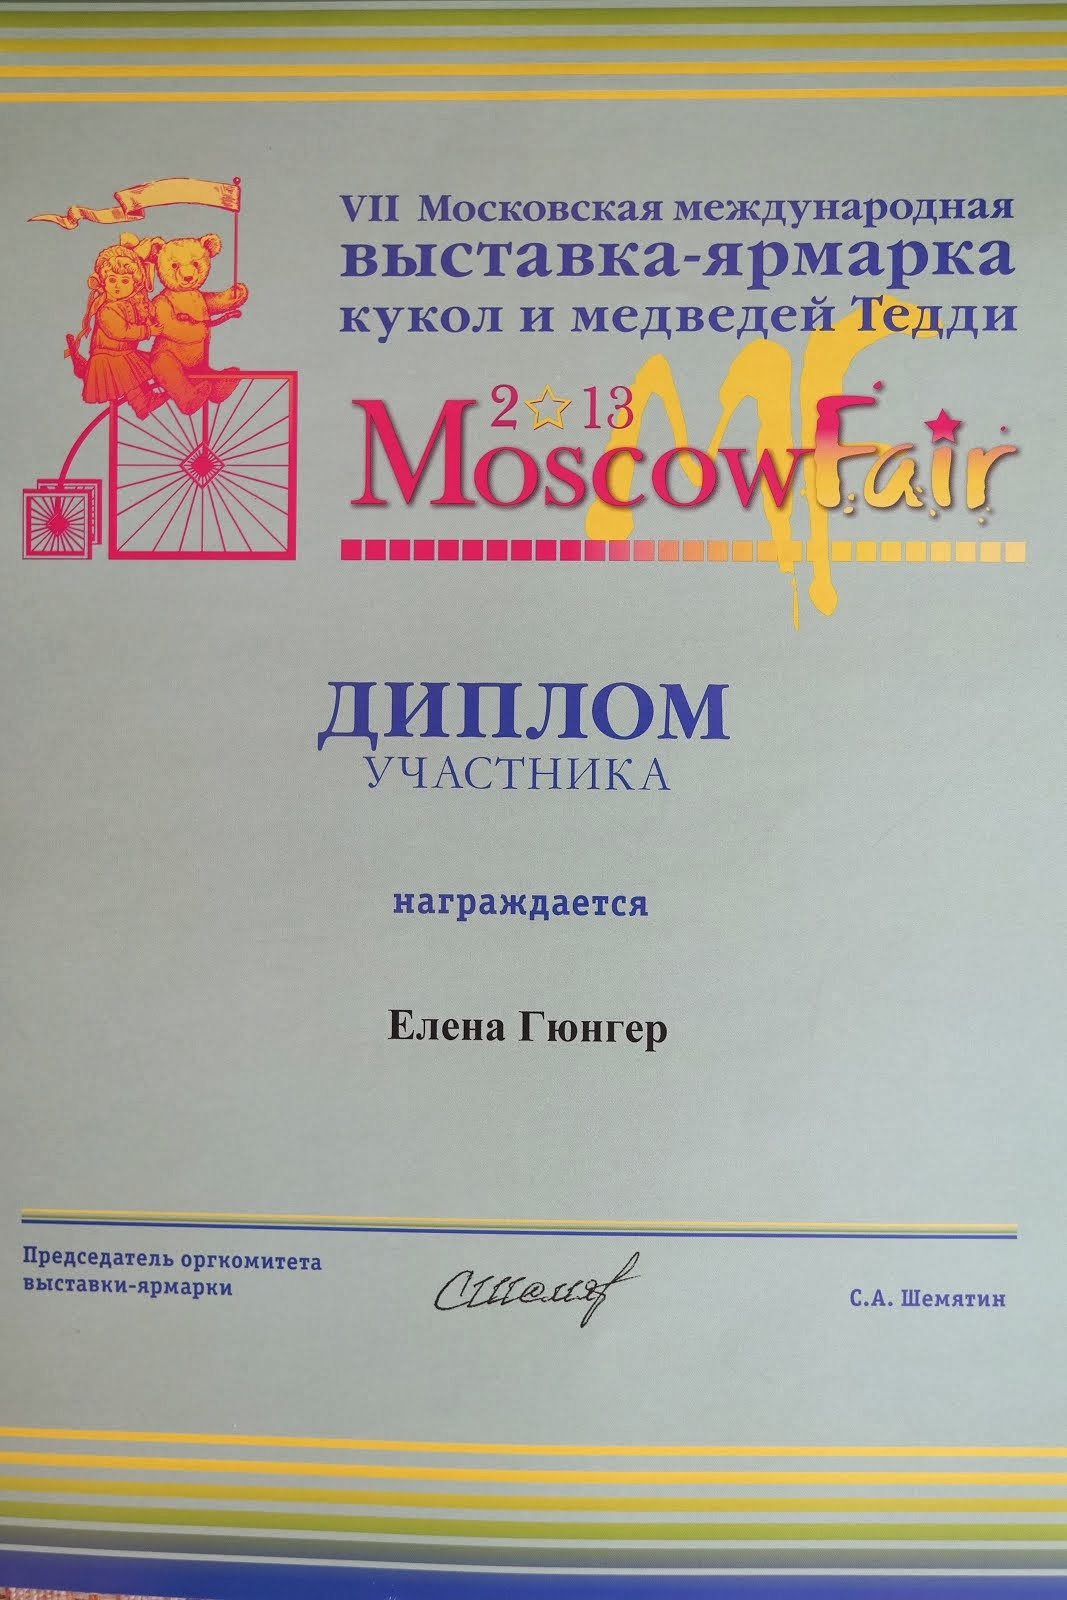 MoscowFair-Москва-2013год